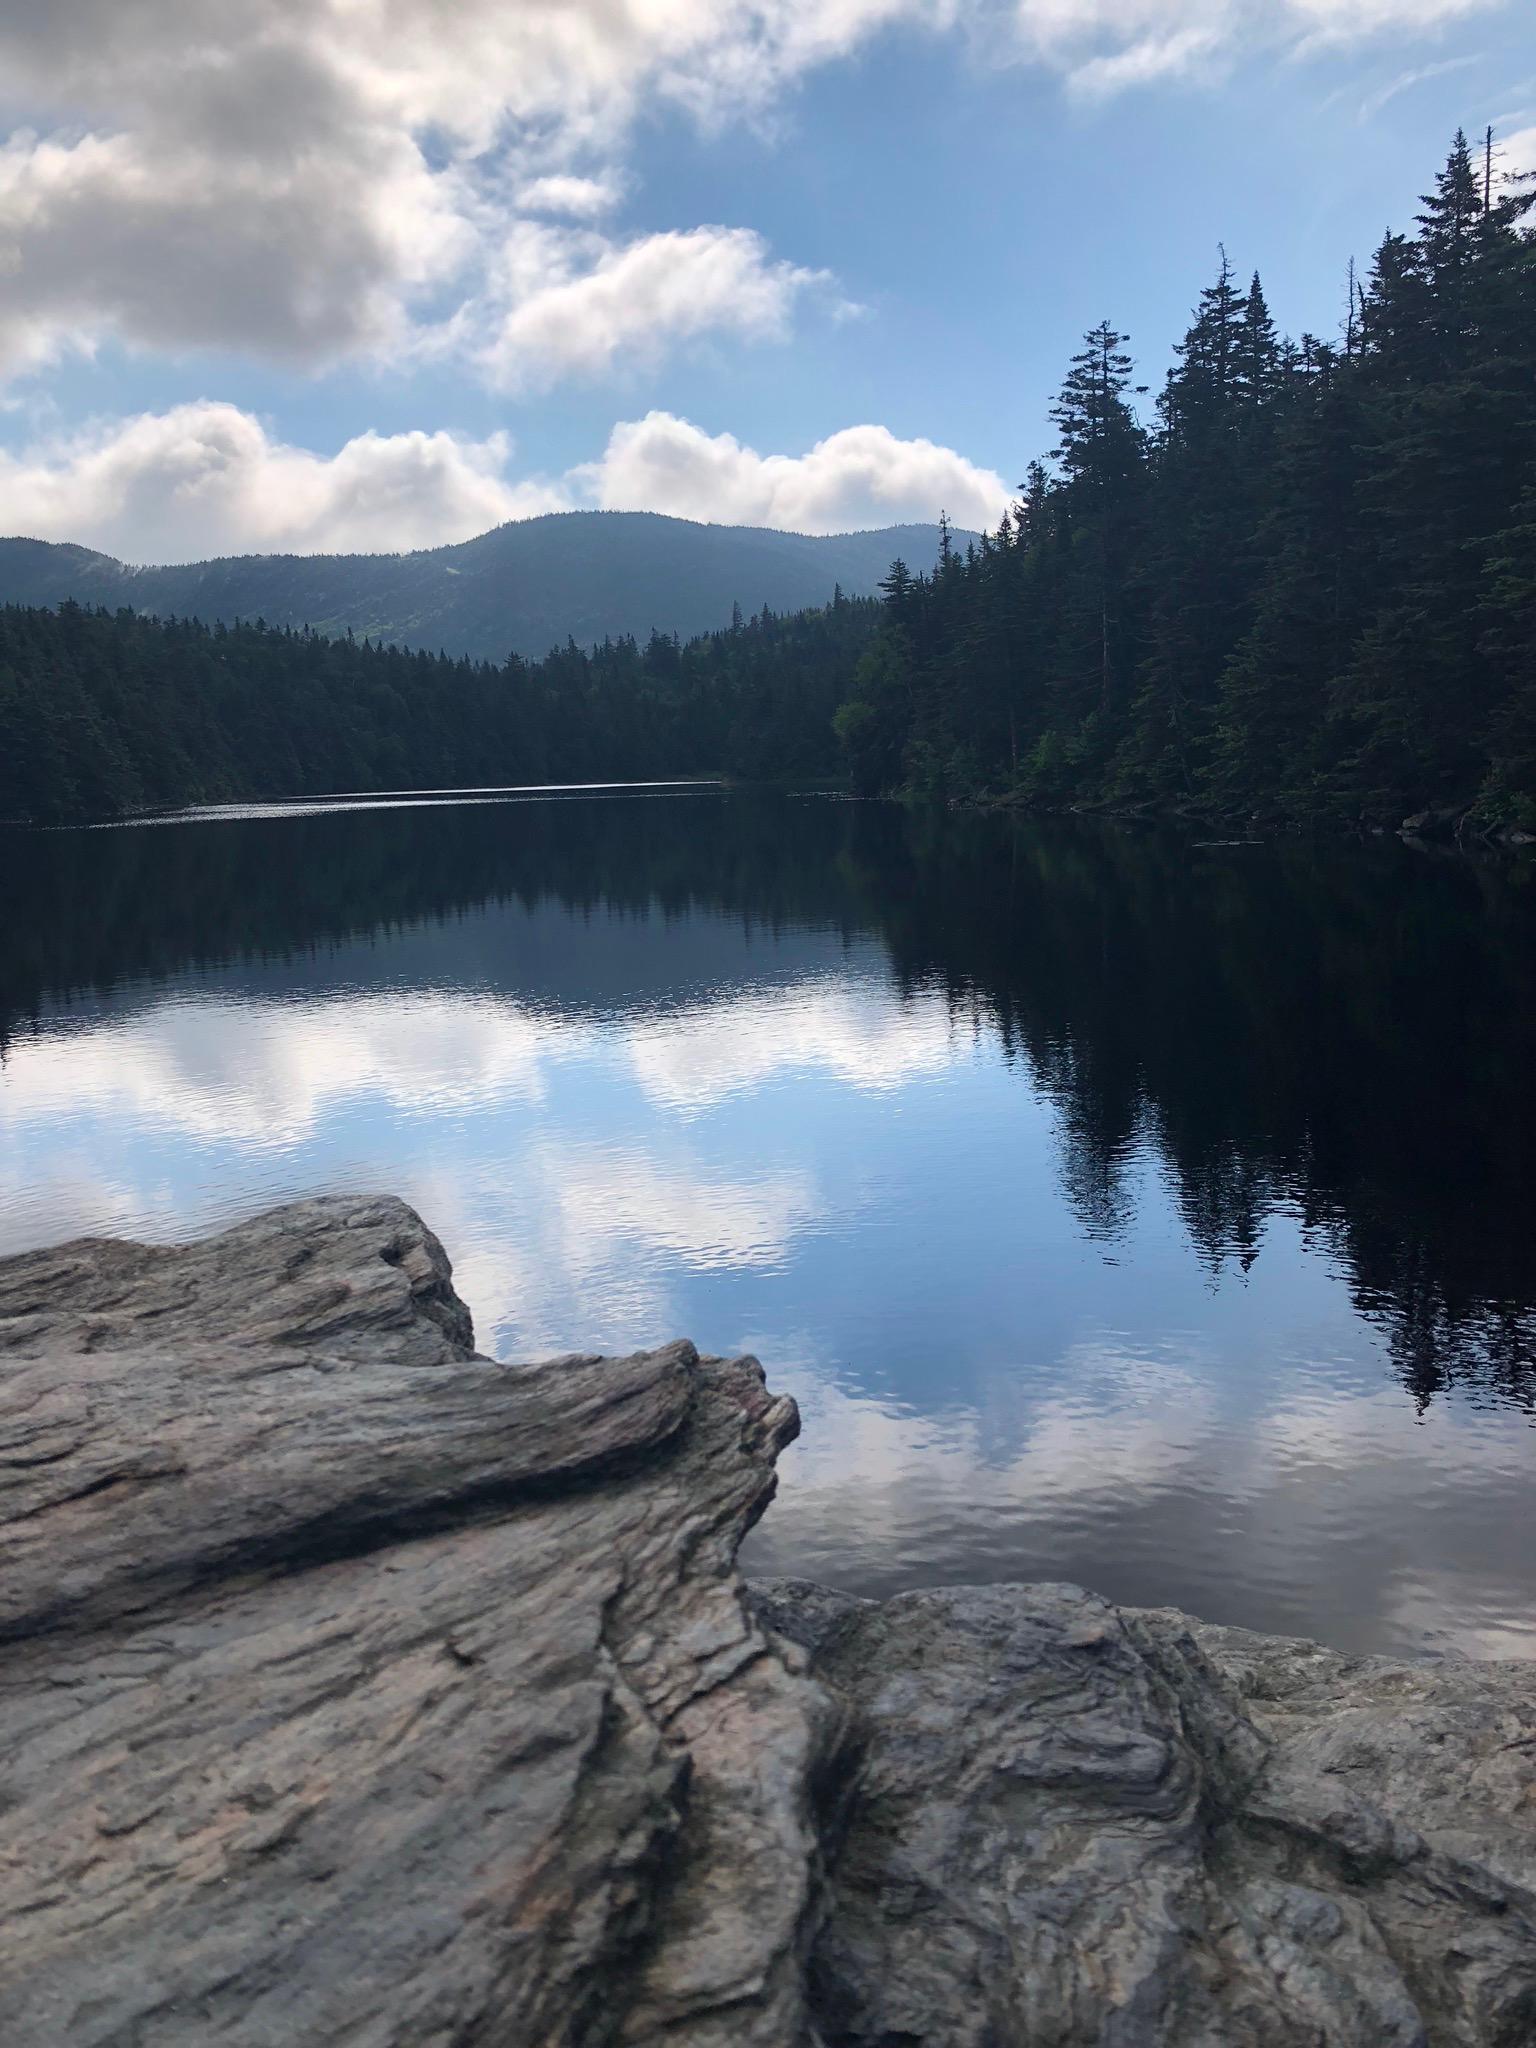 Mountain Lake - Photograph